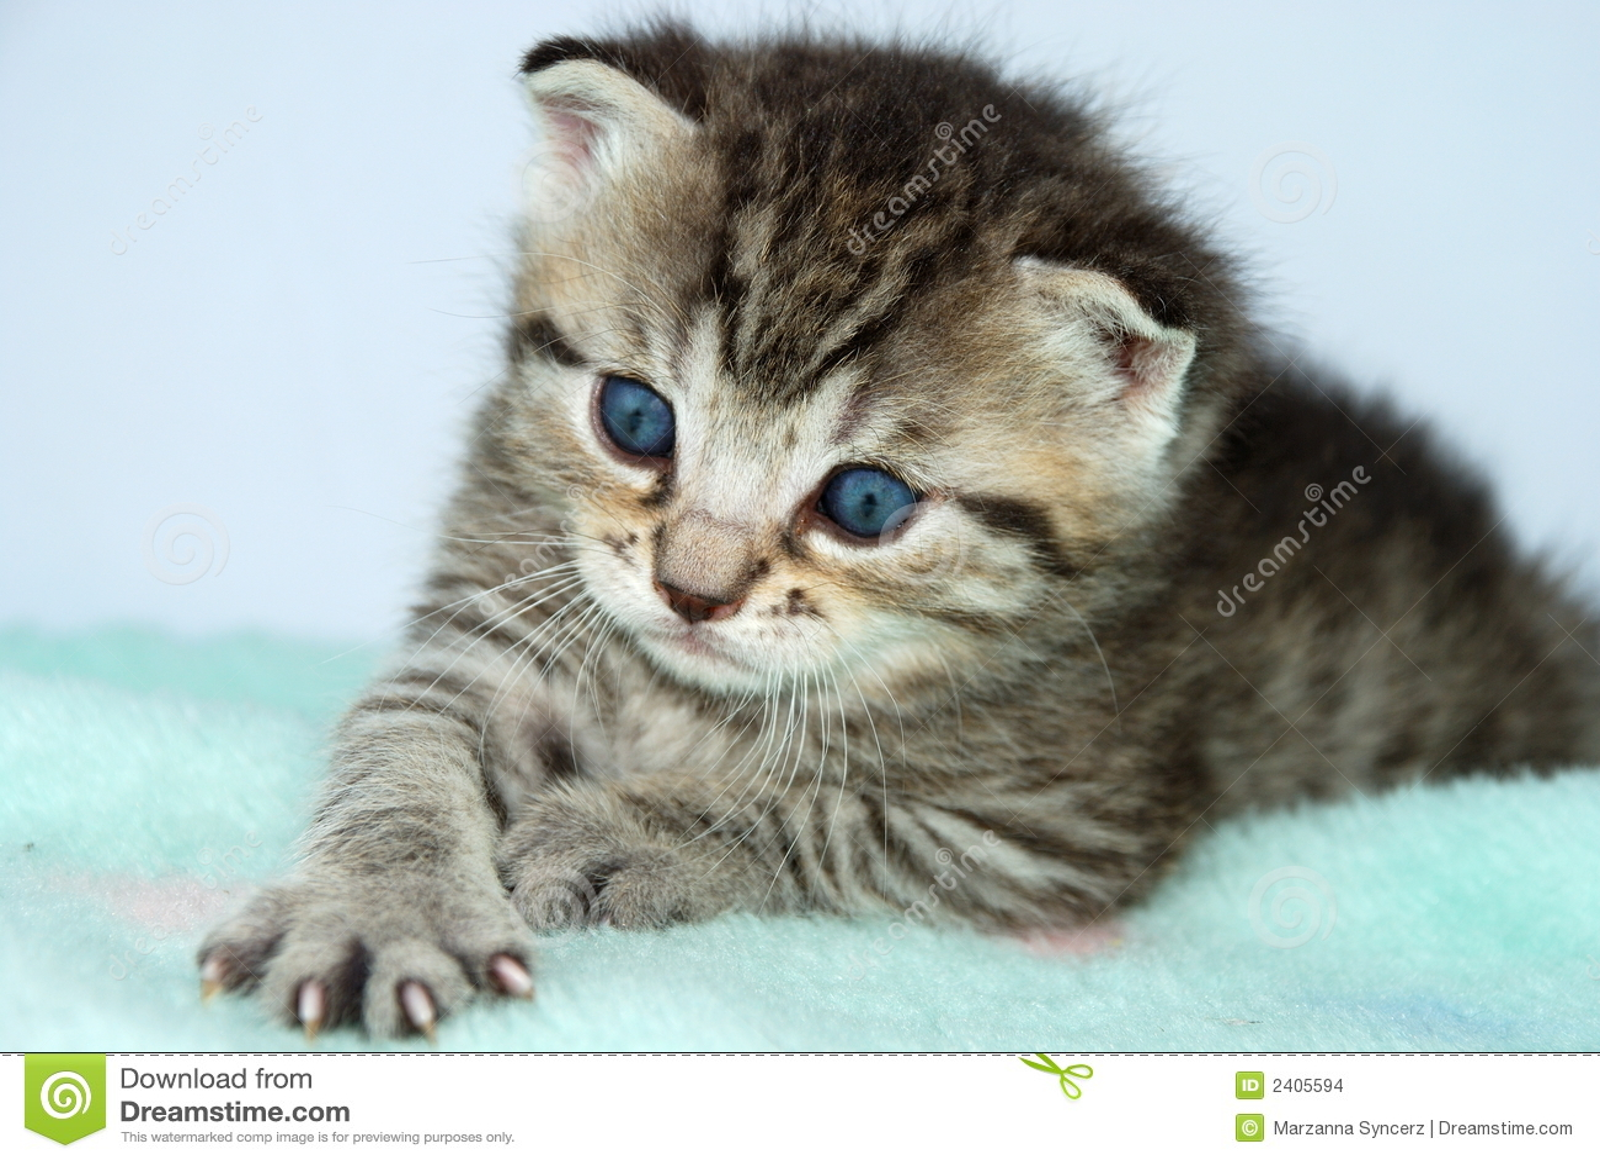 baby kitten wallpaper free